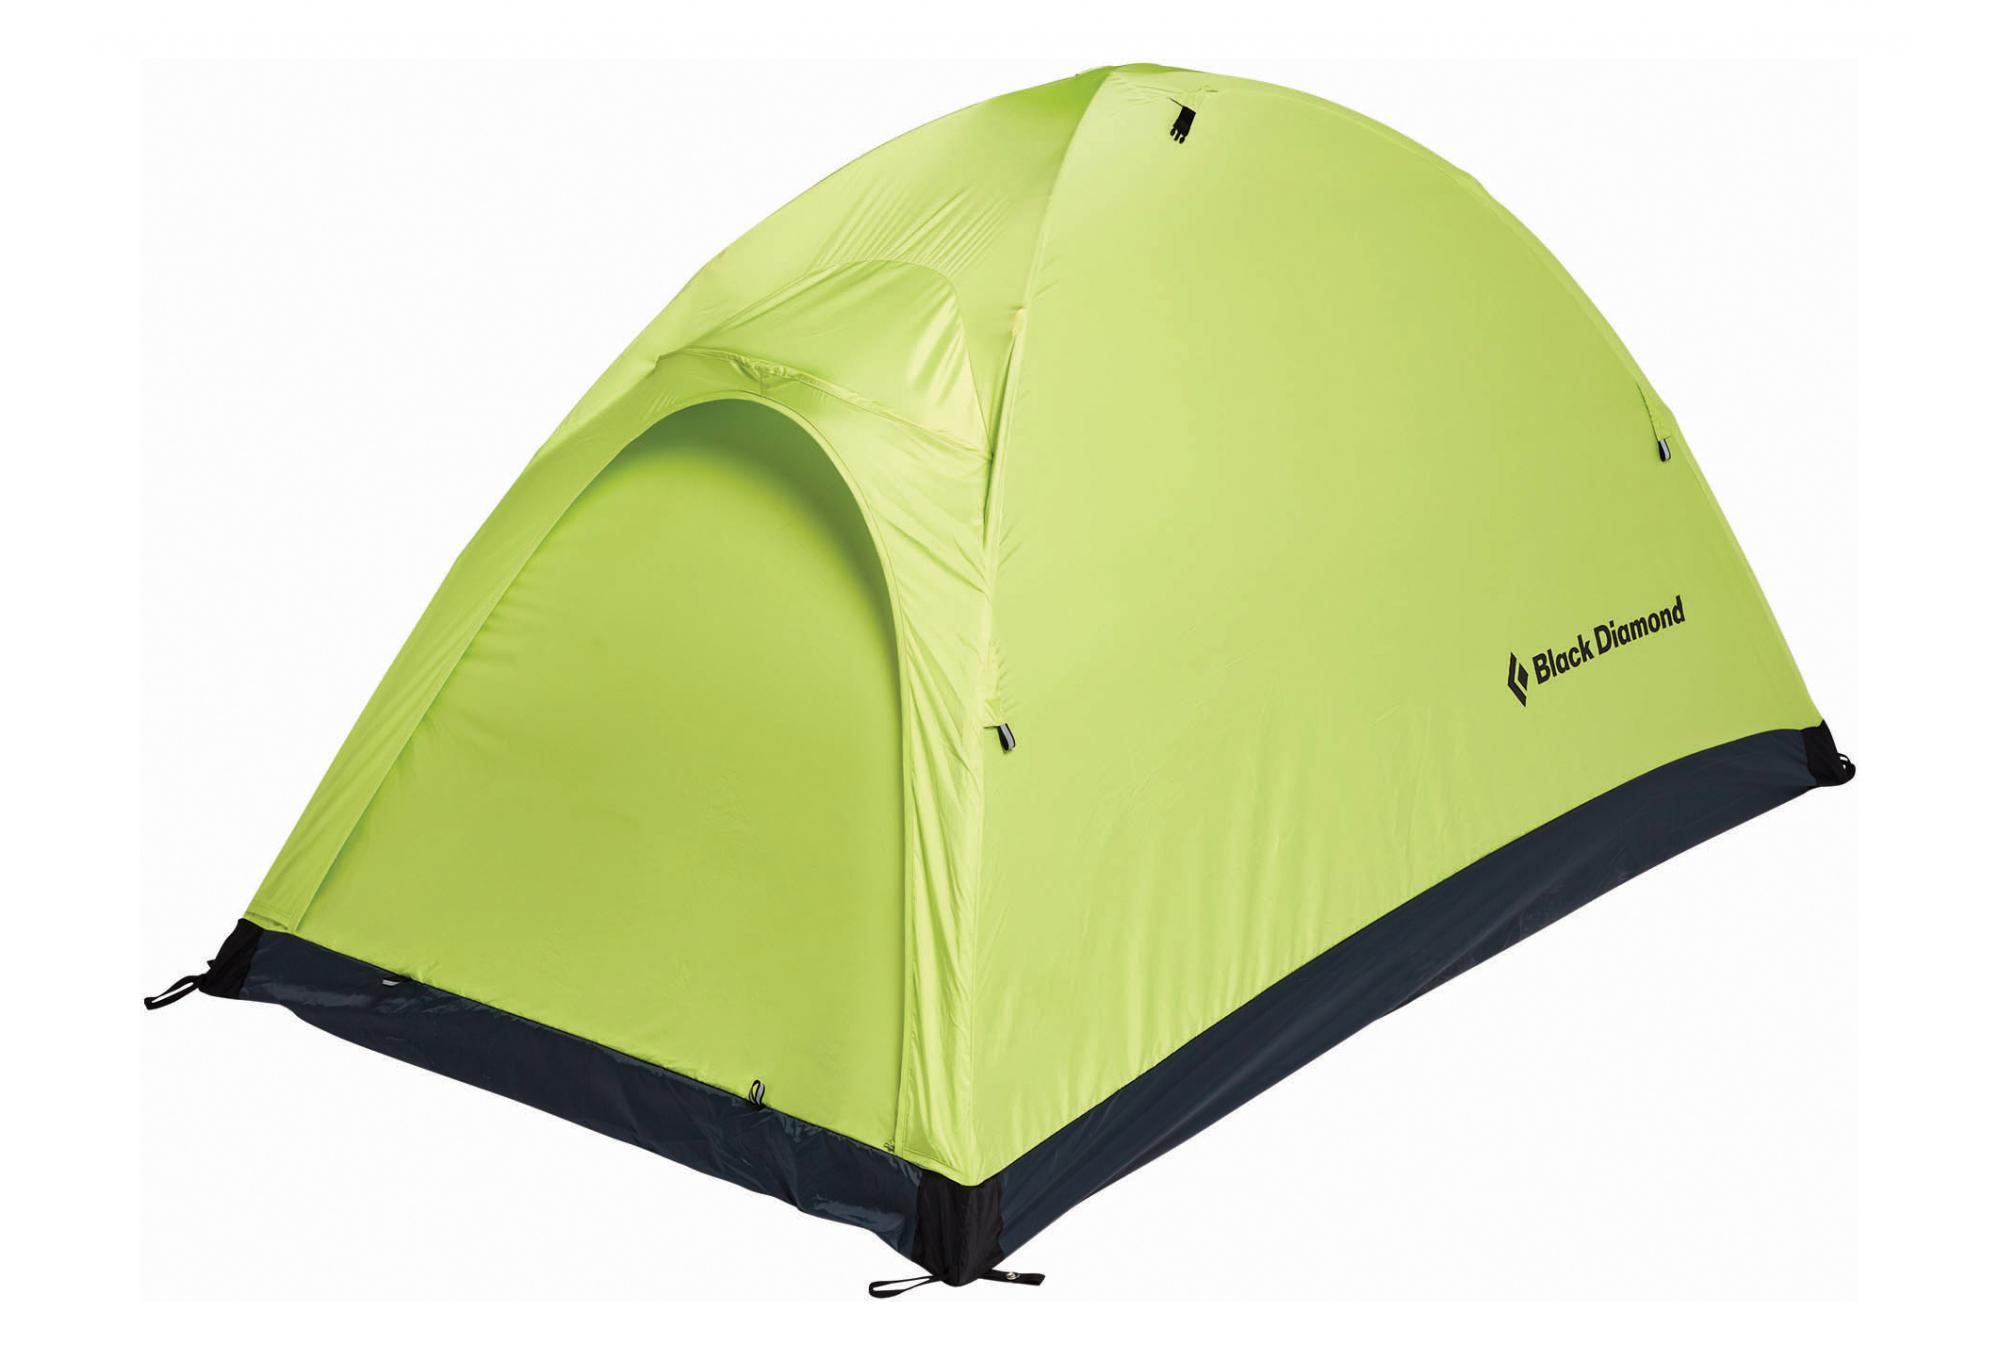 Black Diamond FirstLight 2P Tent 2 Person Hiking Tent Green | Alltricks.com